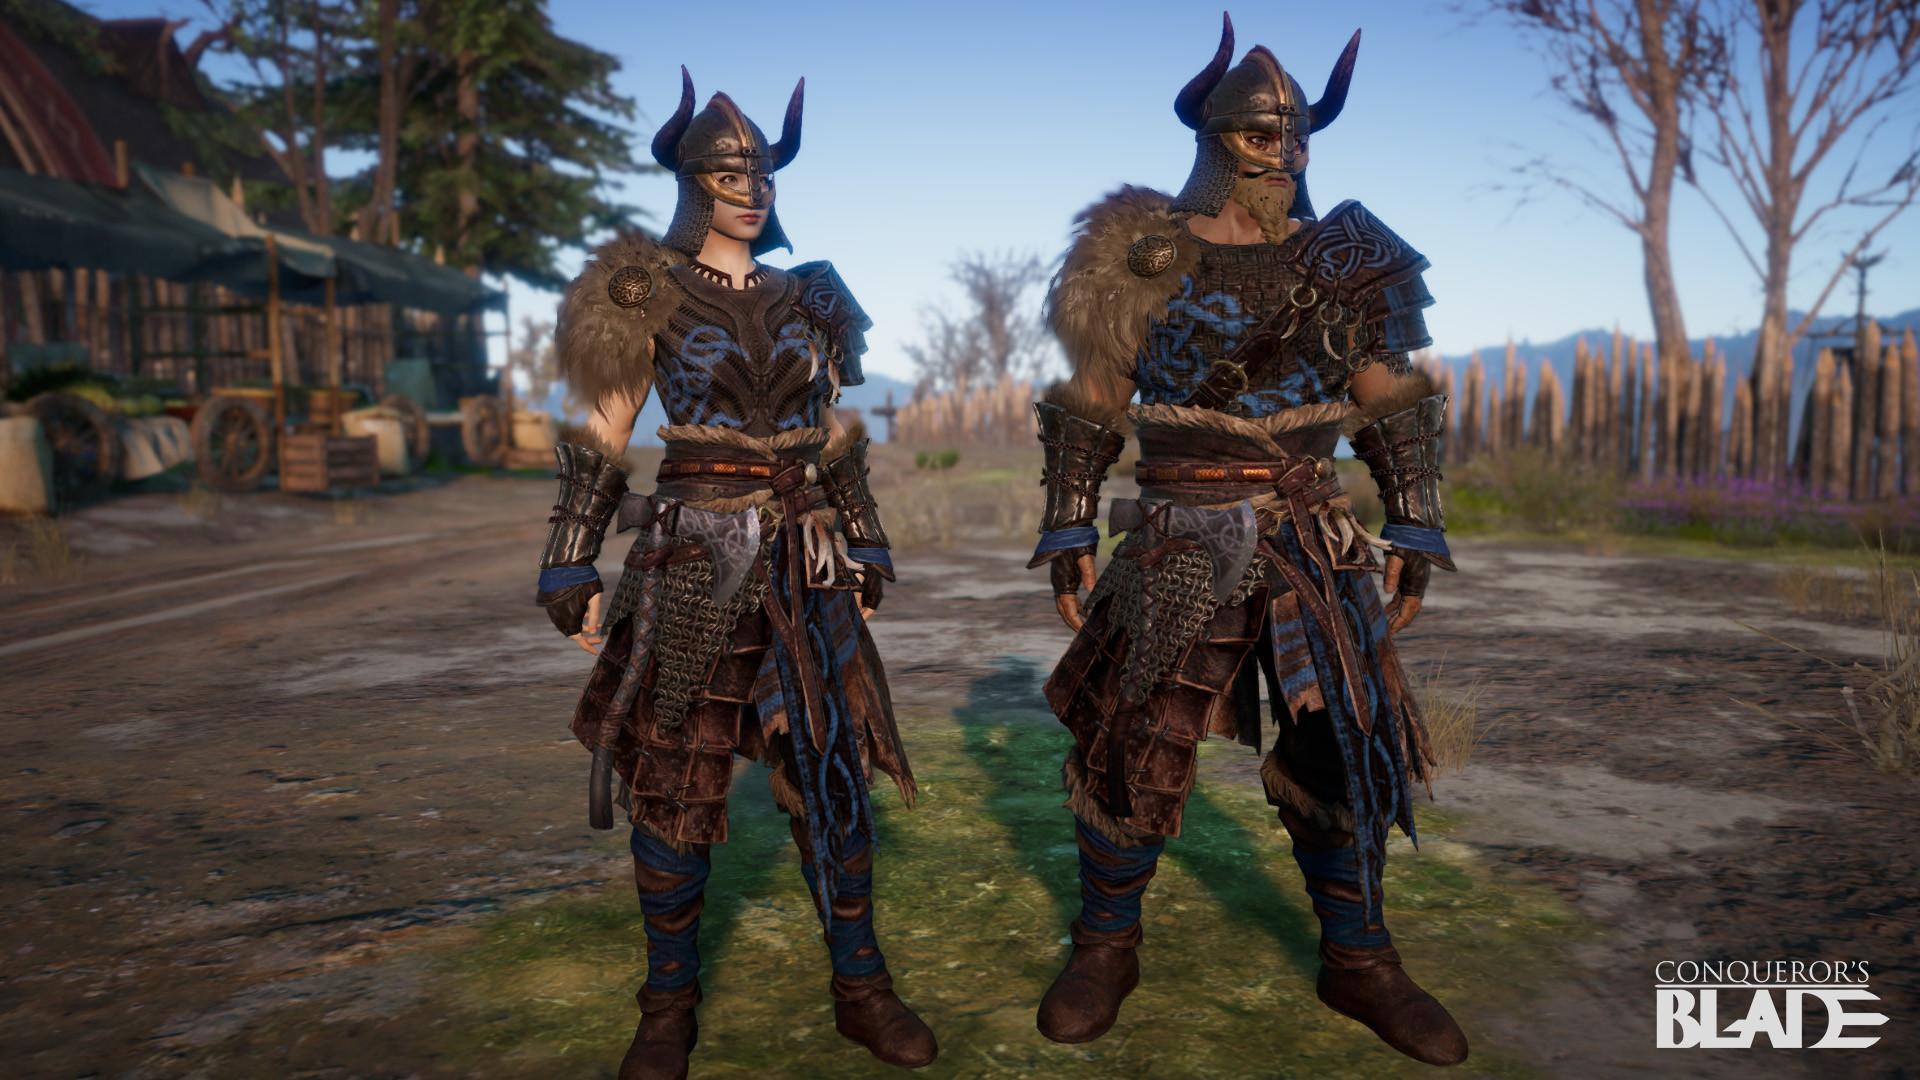 Conqueror's Blade - Battle Saga Collector's Pack PC Fiyatları